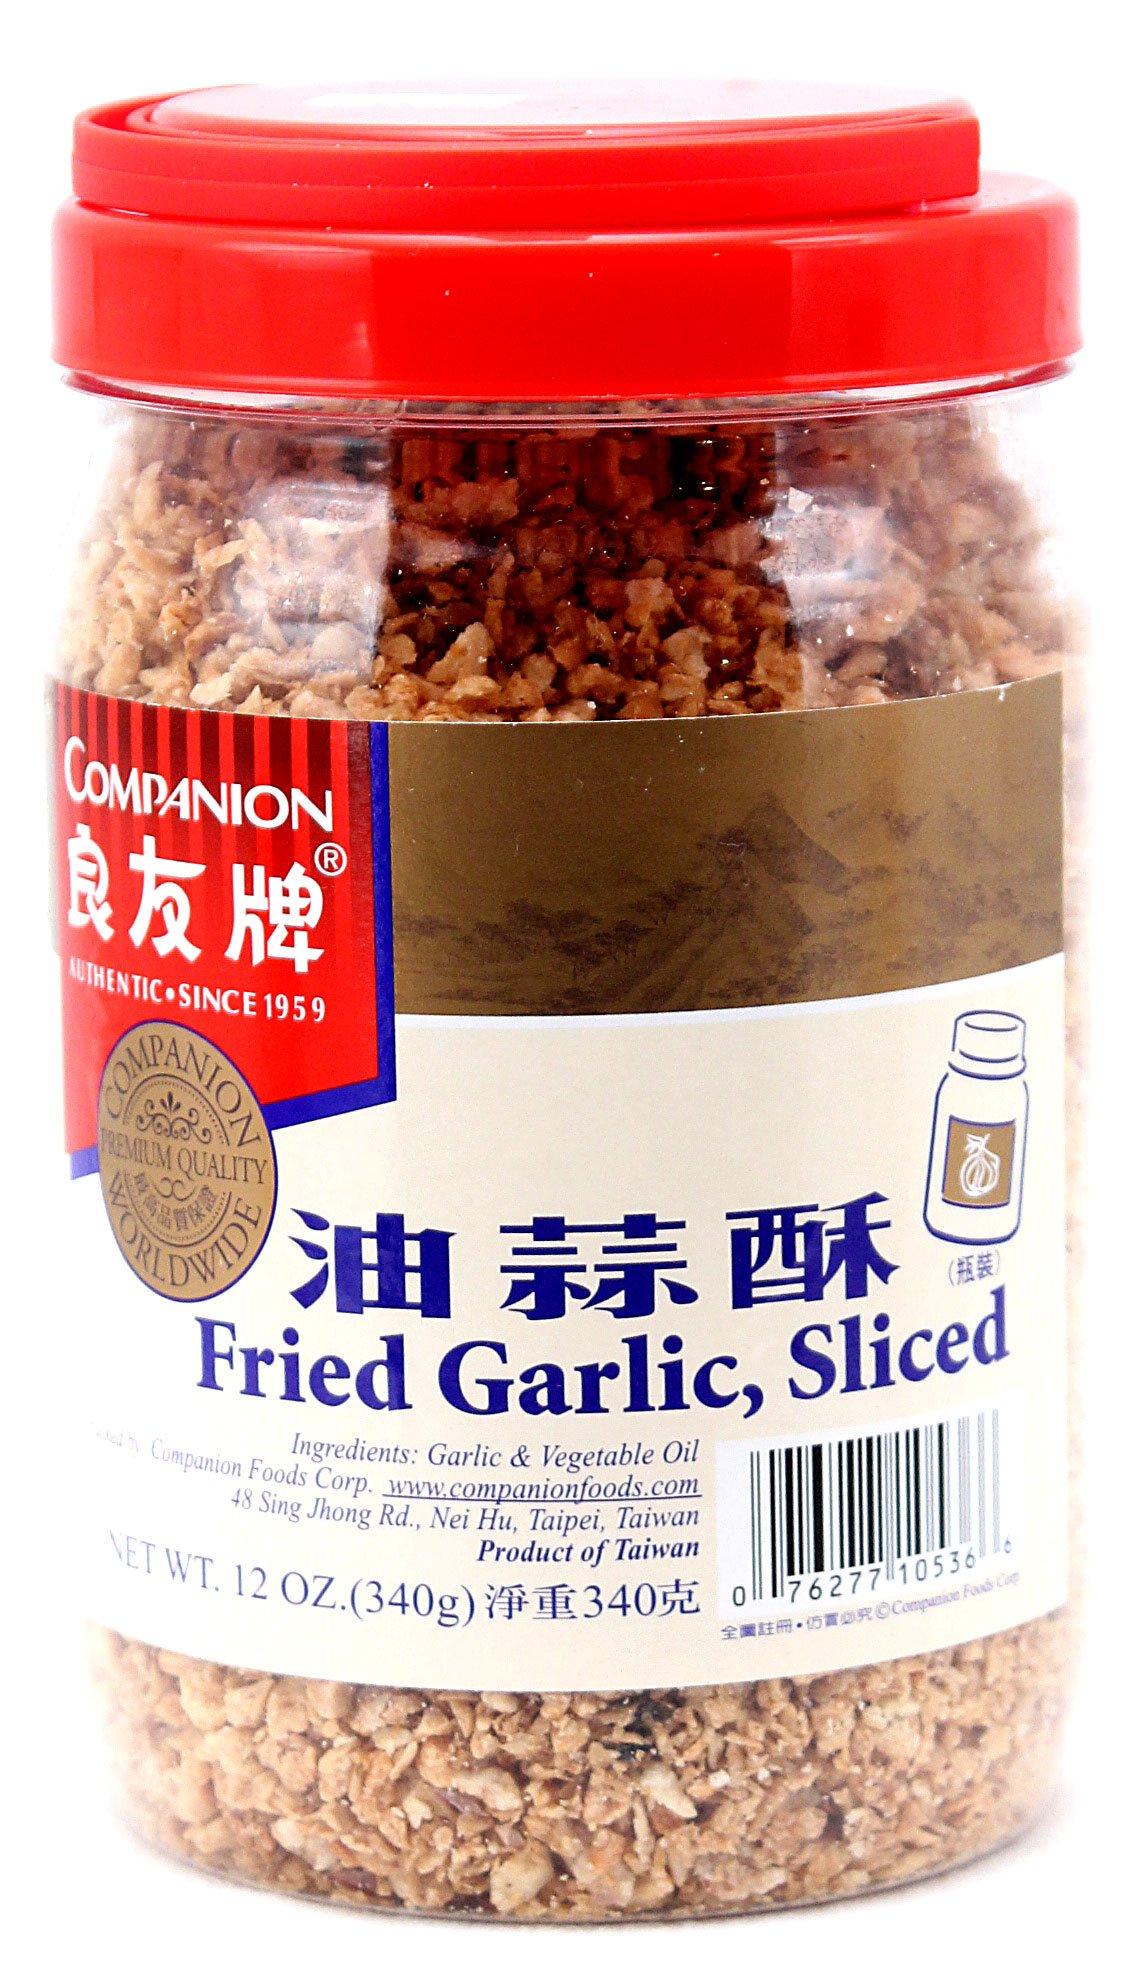 Companion Fried Garlic Sliced 340g